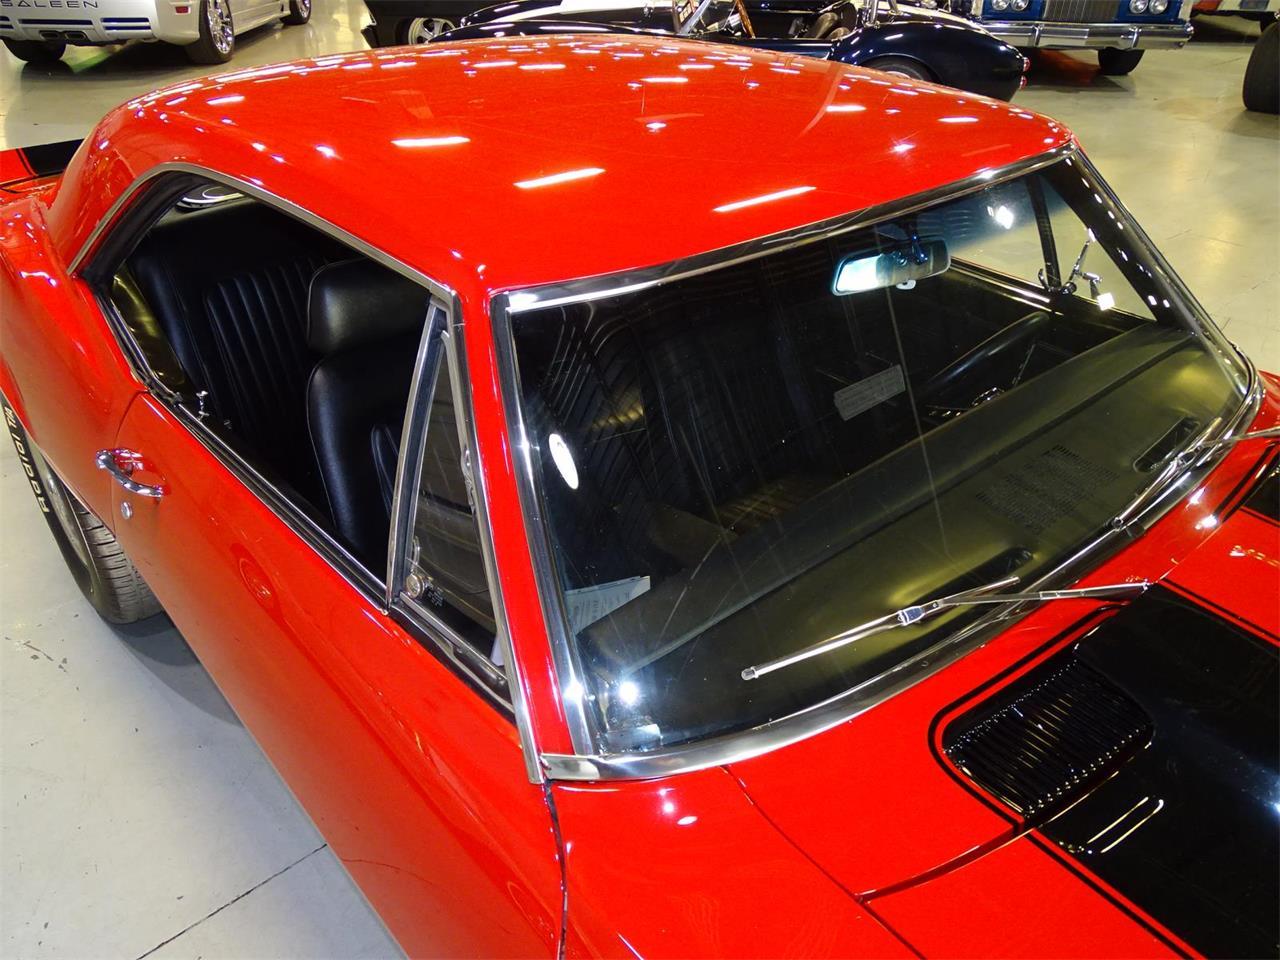 1967 Chevrolet Camaro (CC-1206541) for sale in Clayton, California